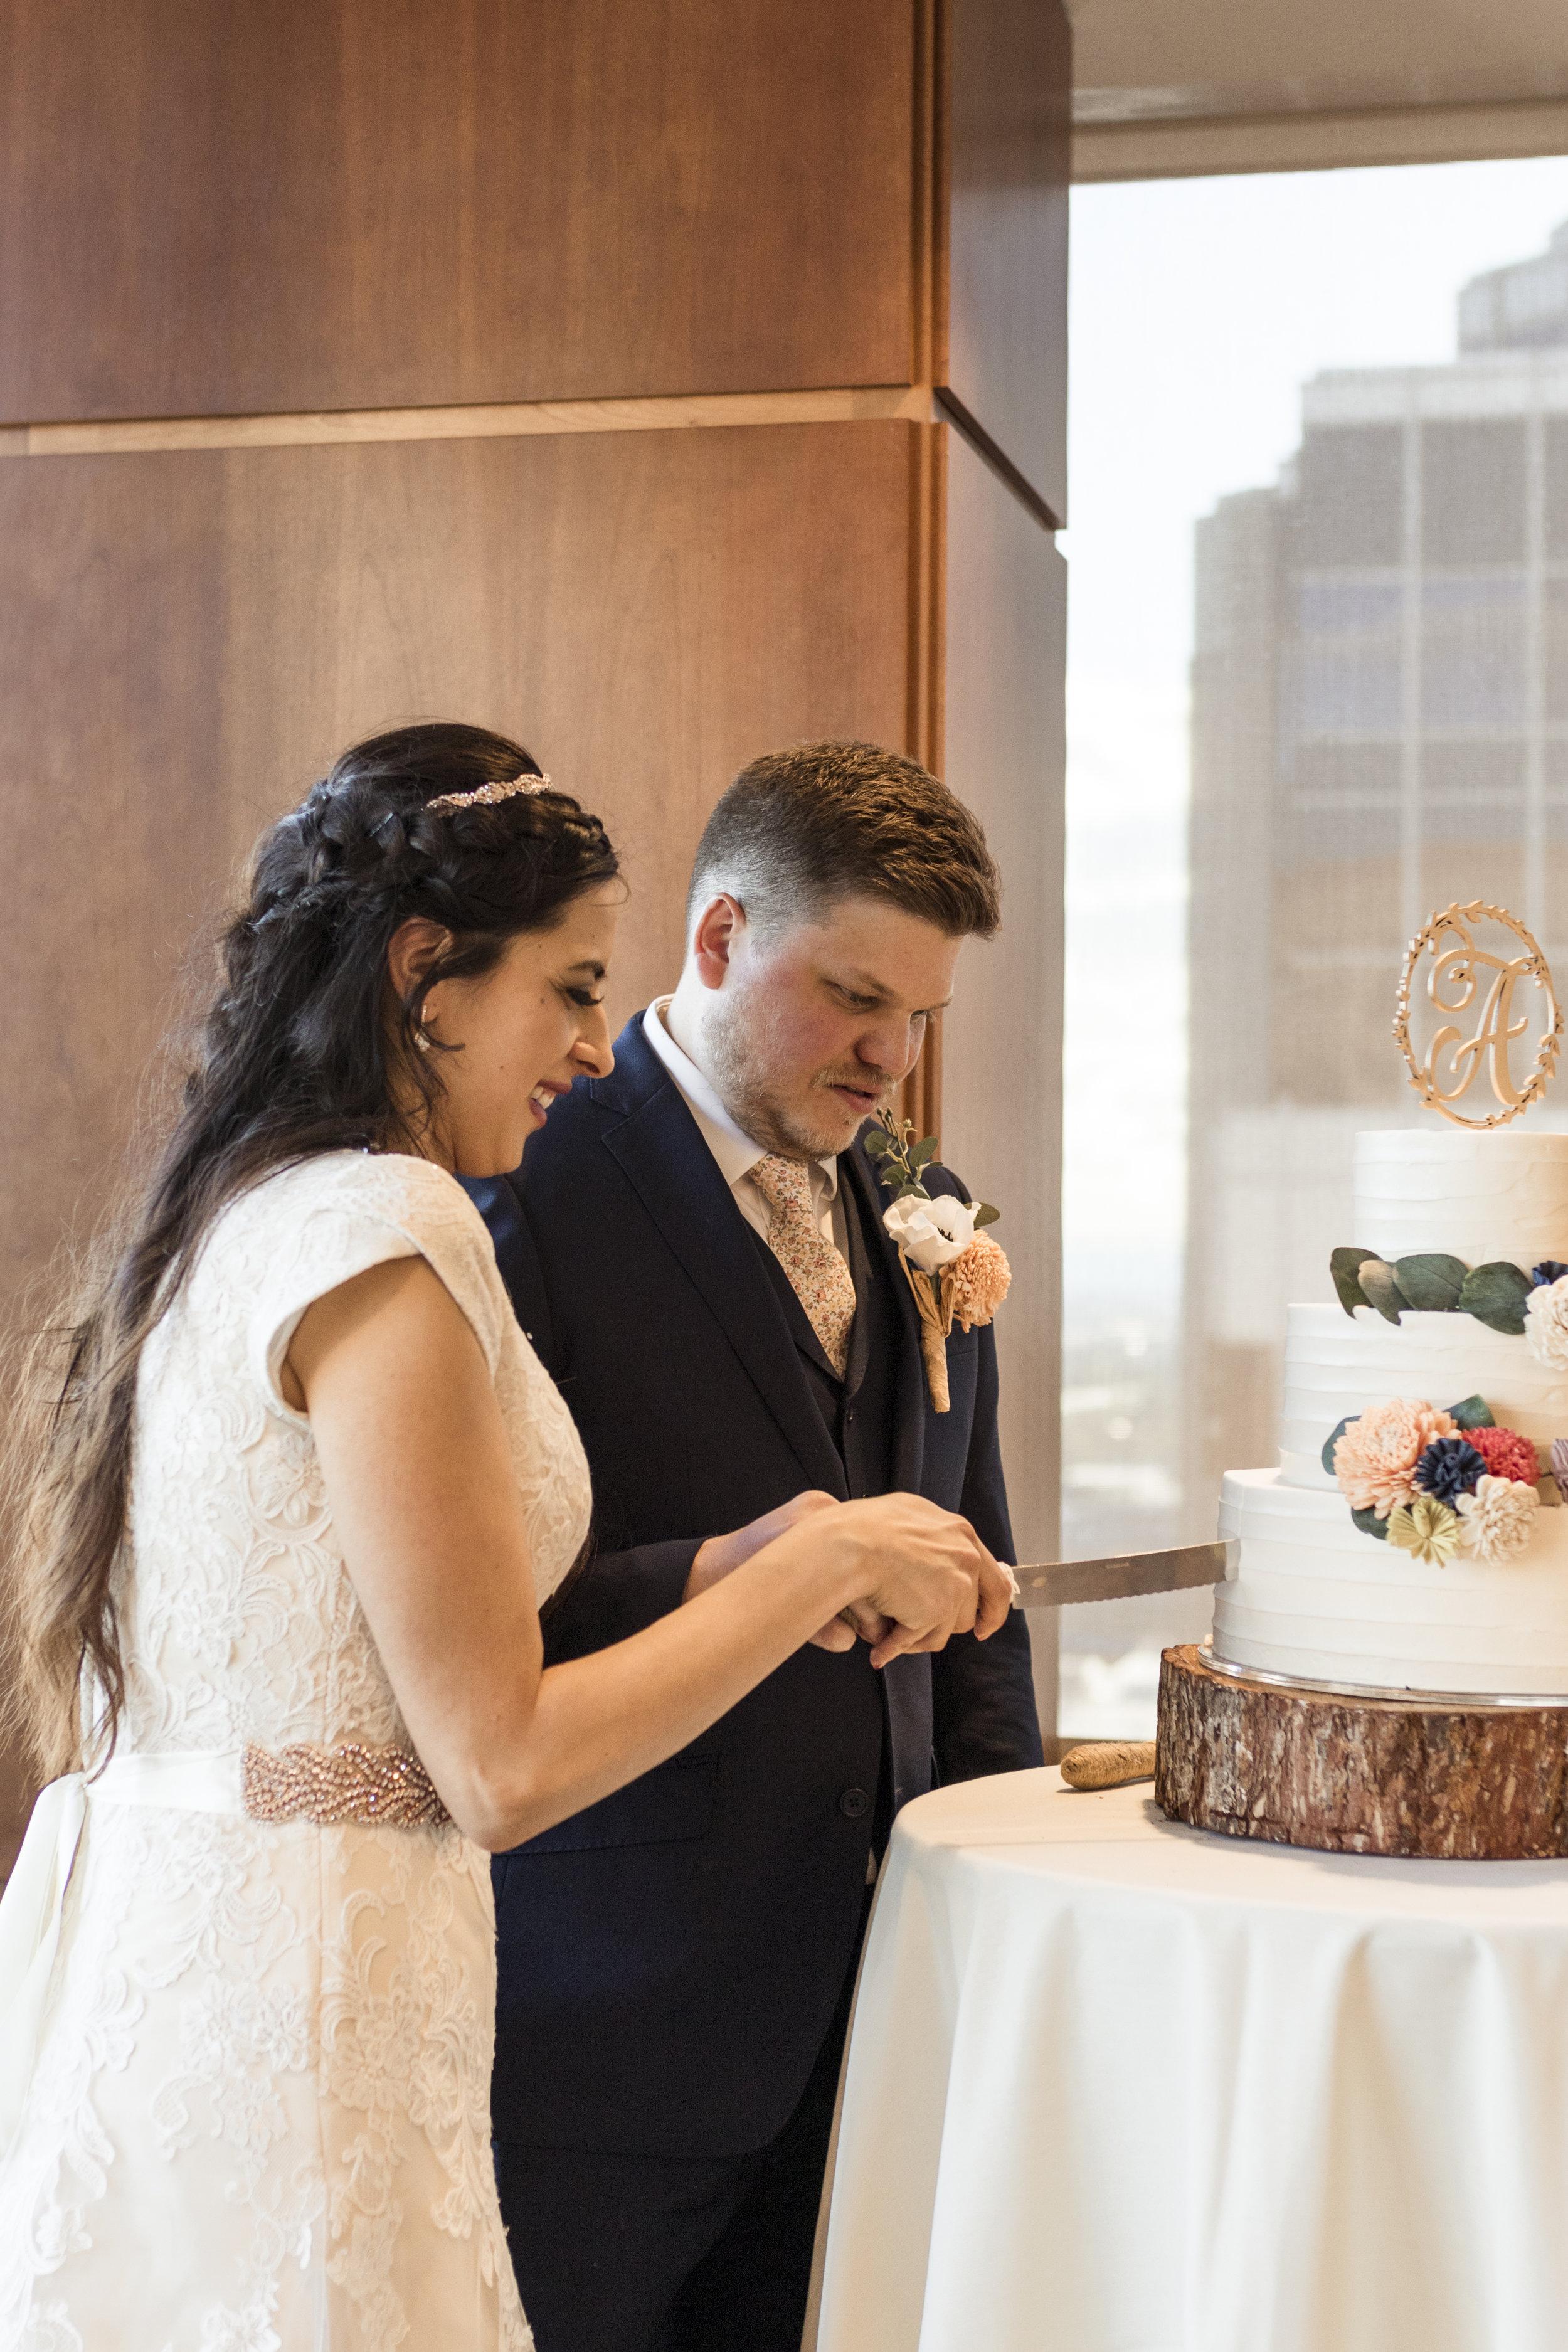 Utah Spring Wedding Reception in the Zions Bank Founders Room by Bri Bergman Photography13.JPG